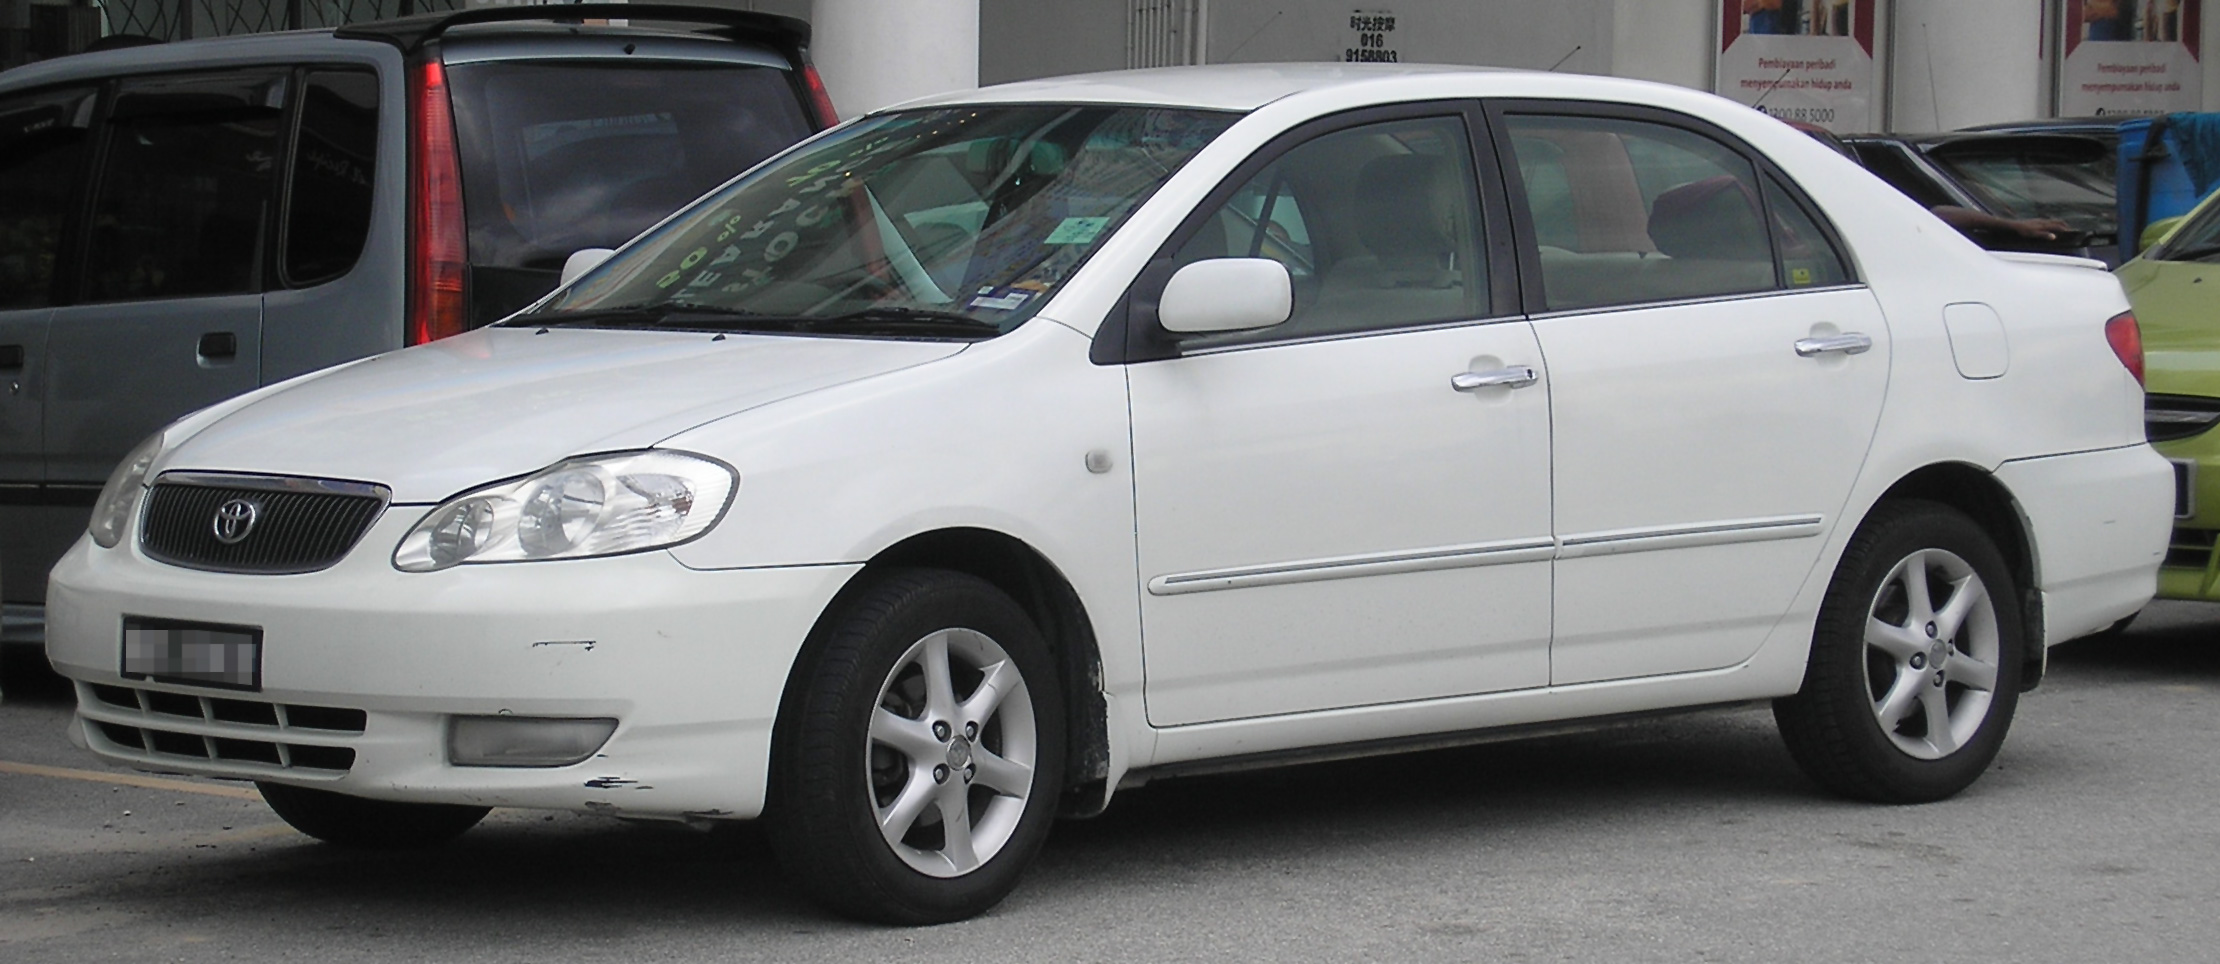 Toyota Corolla Altis 2007